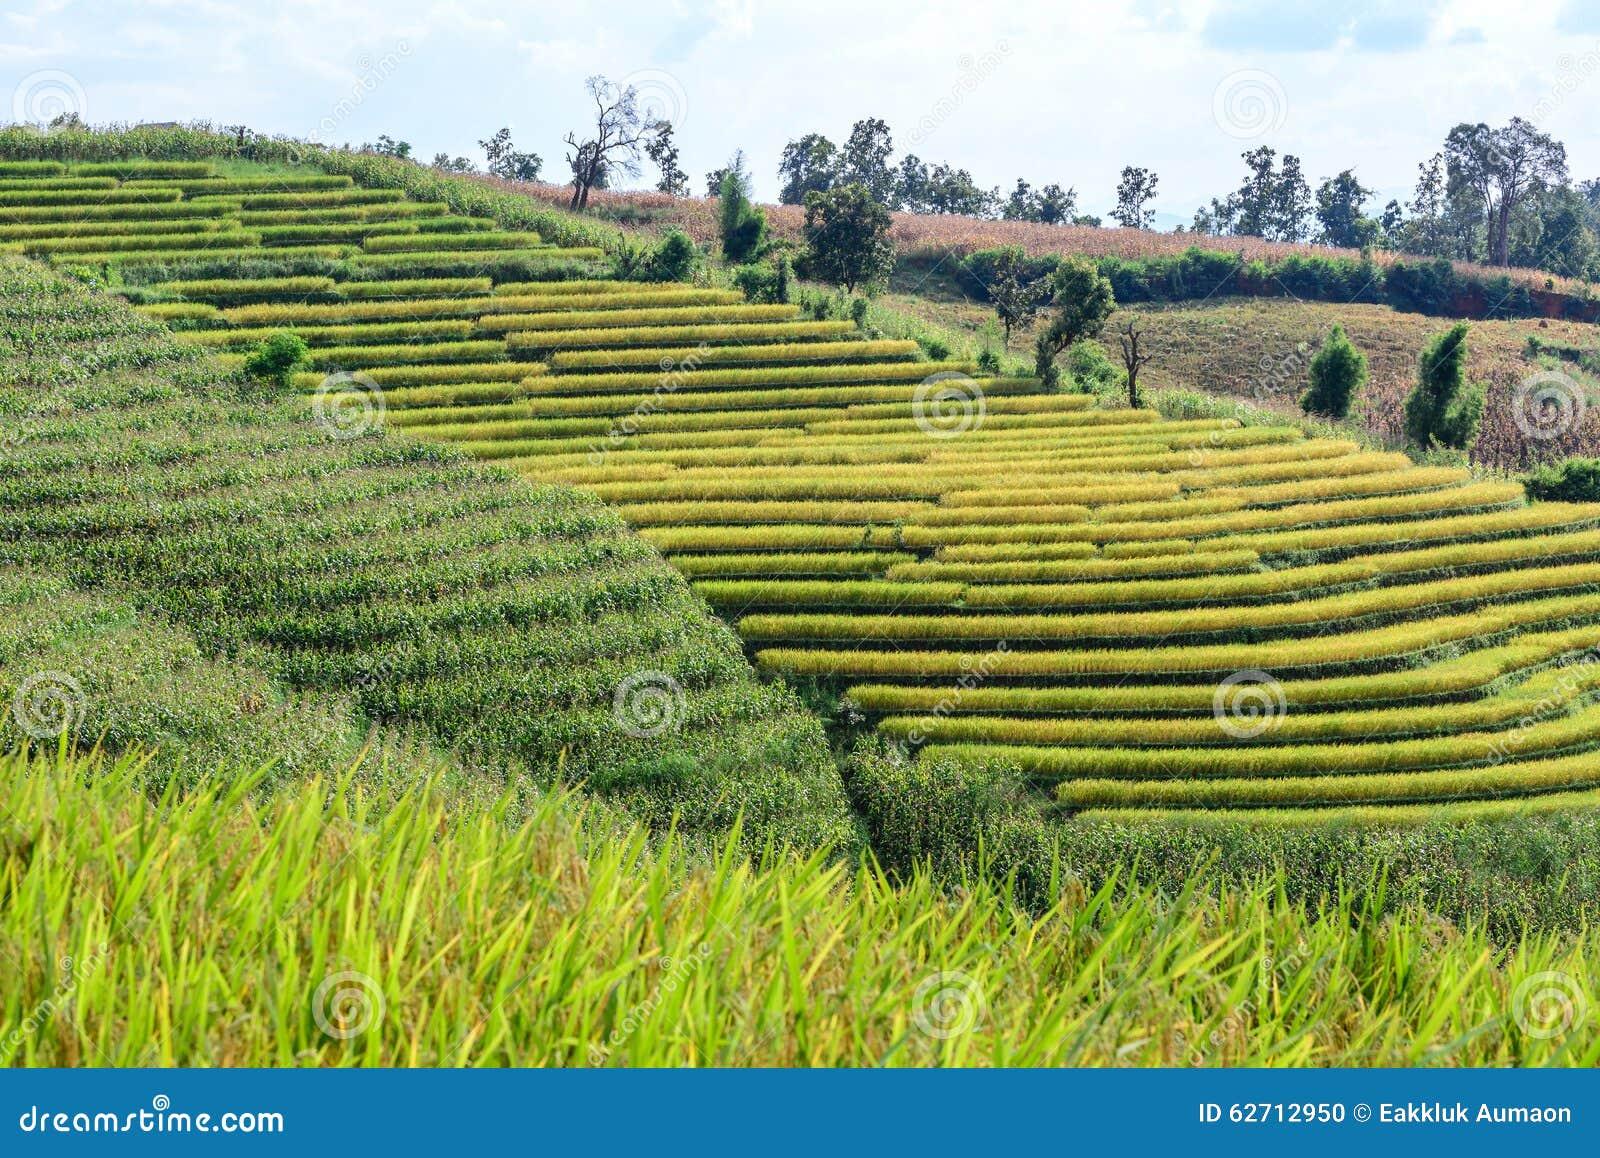 Terraced τομέας ρυζιού με το υπόβαθρο βουνών στην απαγόρευση PA Bong Piang, Chiang Mai στην Ταϊλάνδη